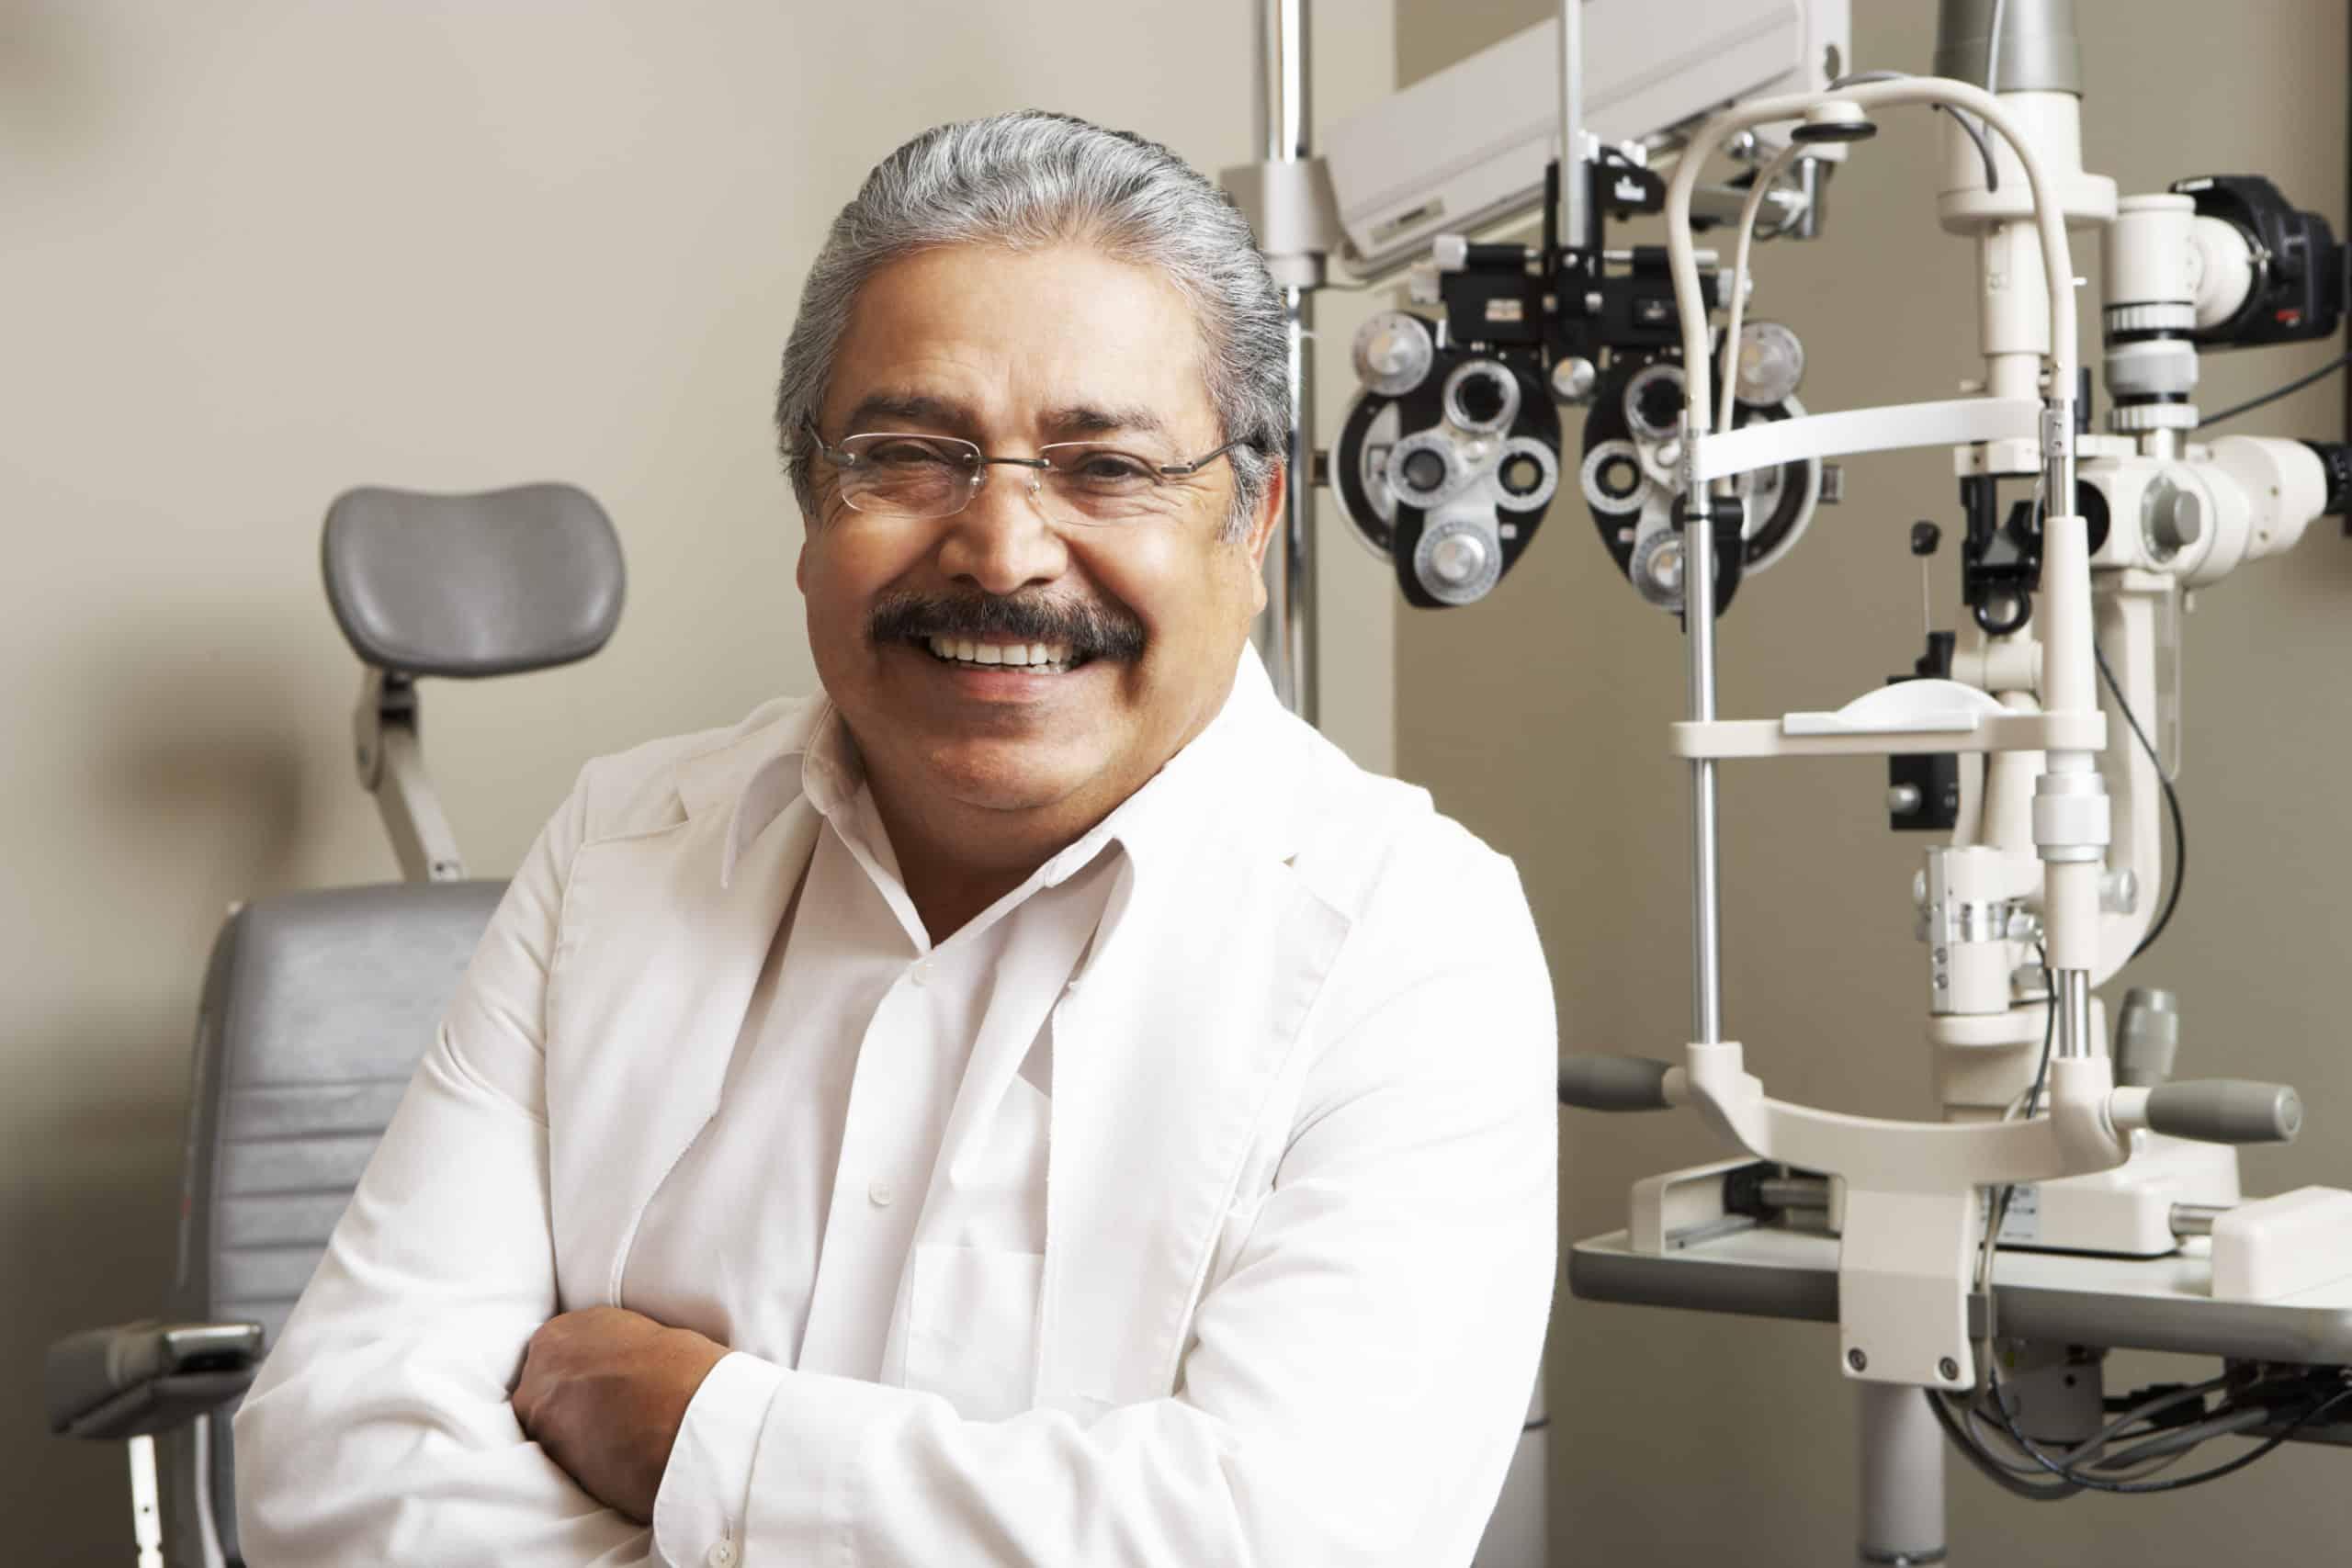 An eye clinic professional